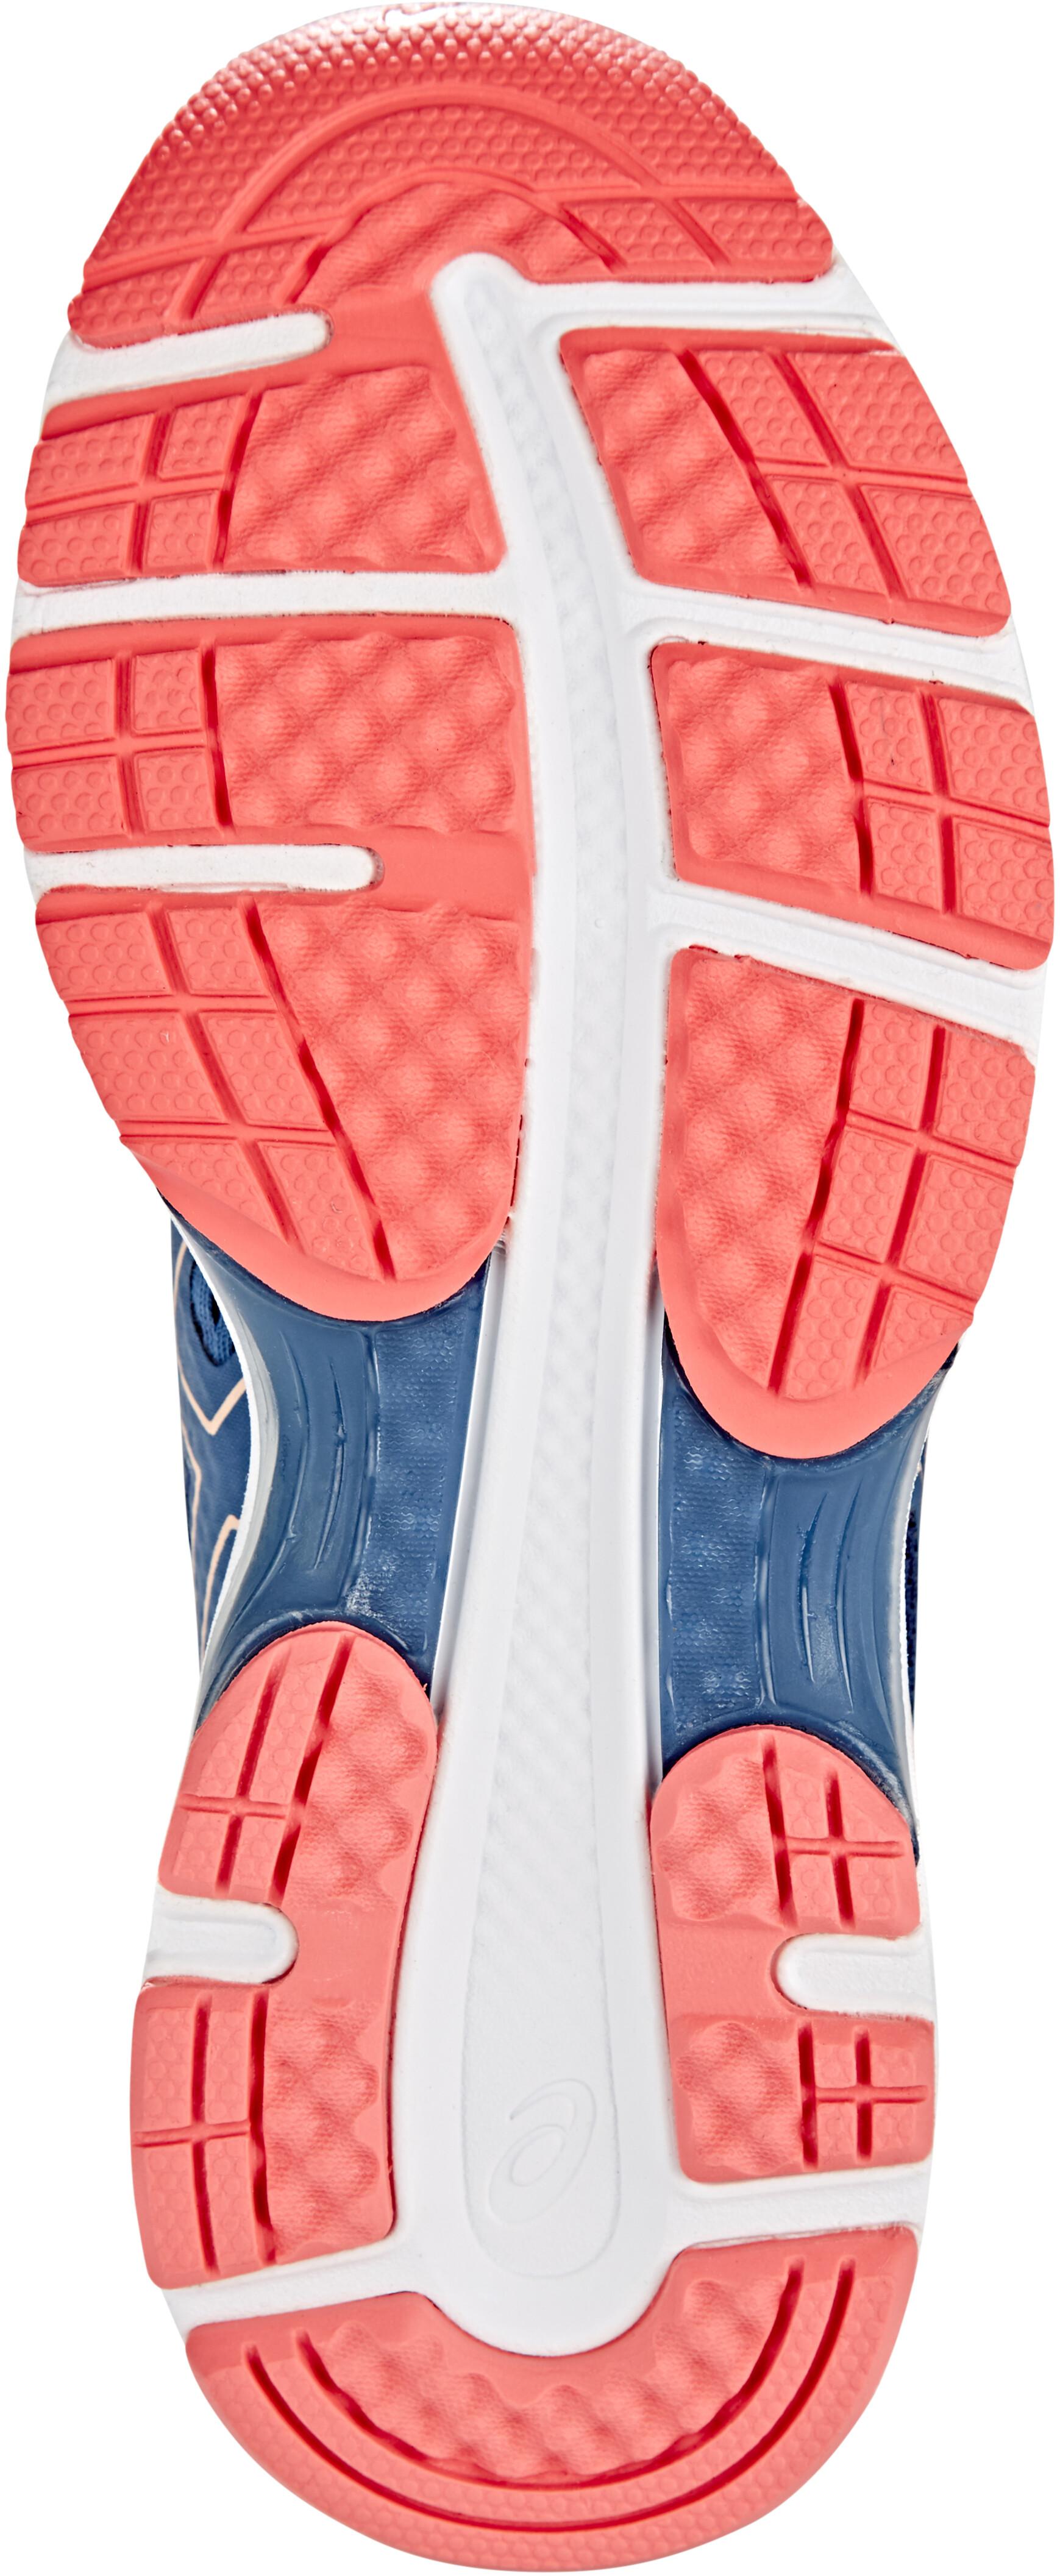 e0e7adbbc1f asics Gel-Pulse 10 Running Shoes Women pink blue at Bikester.co.uk